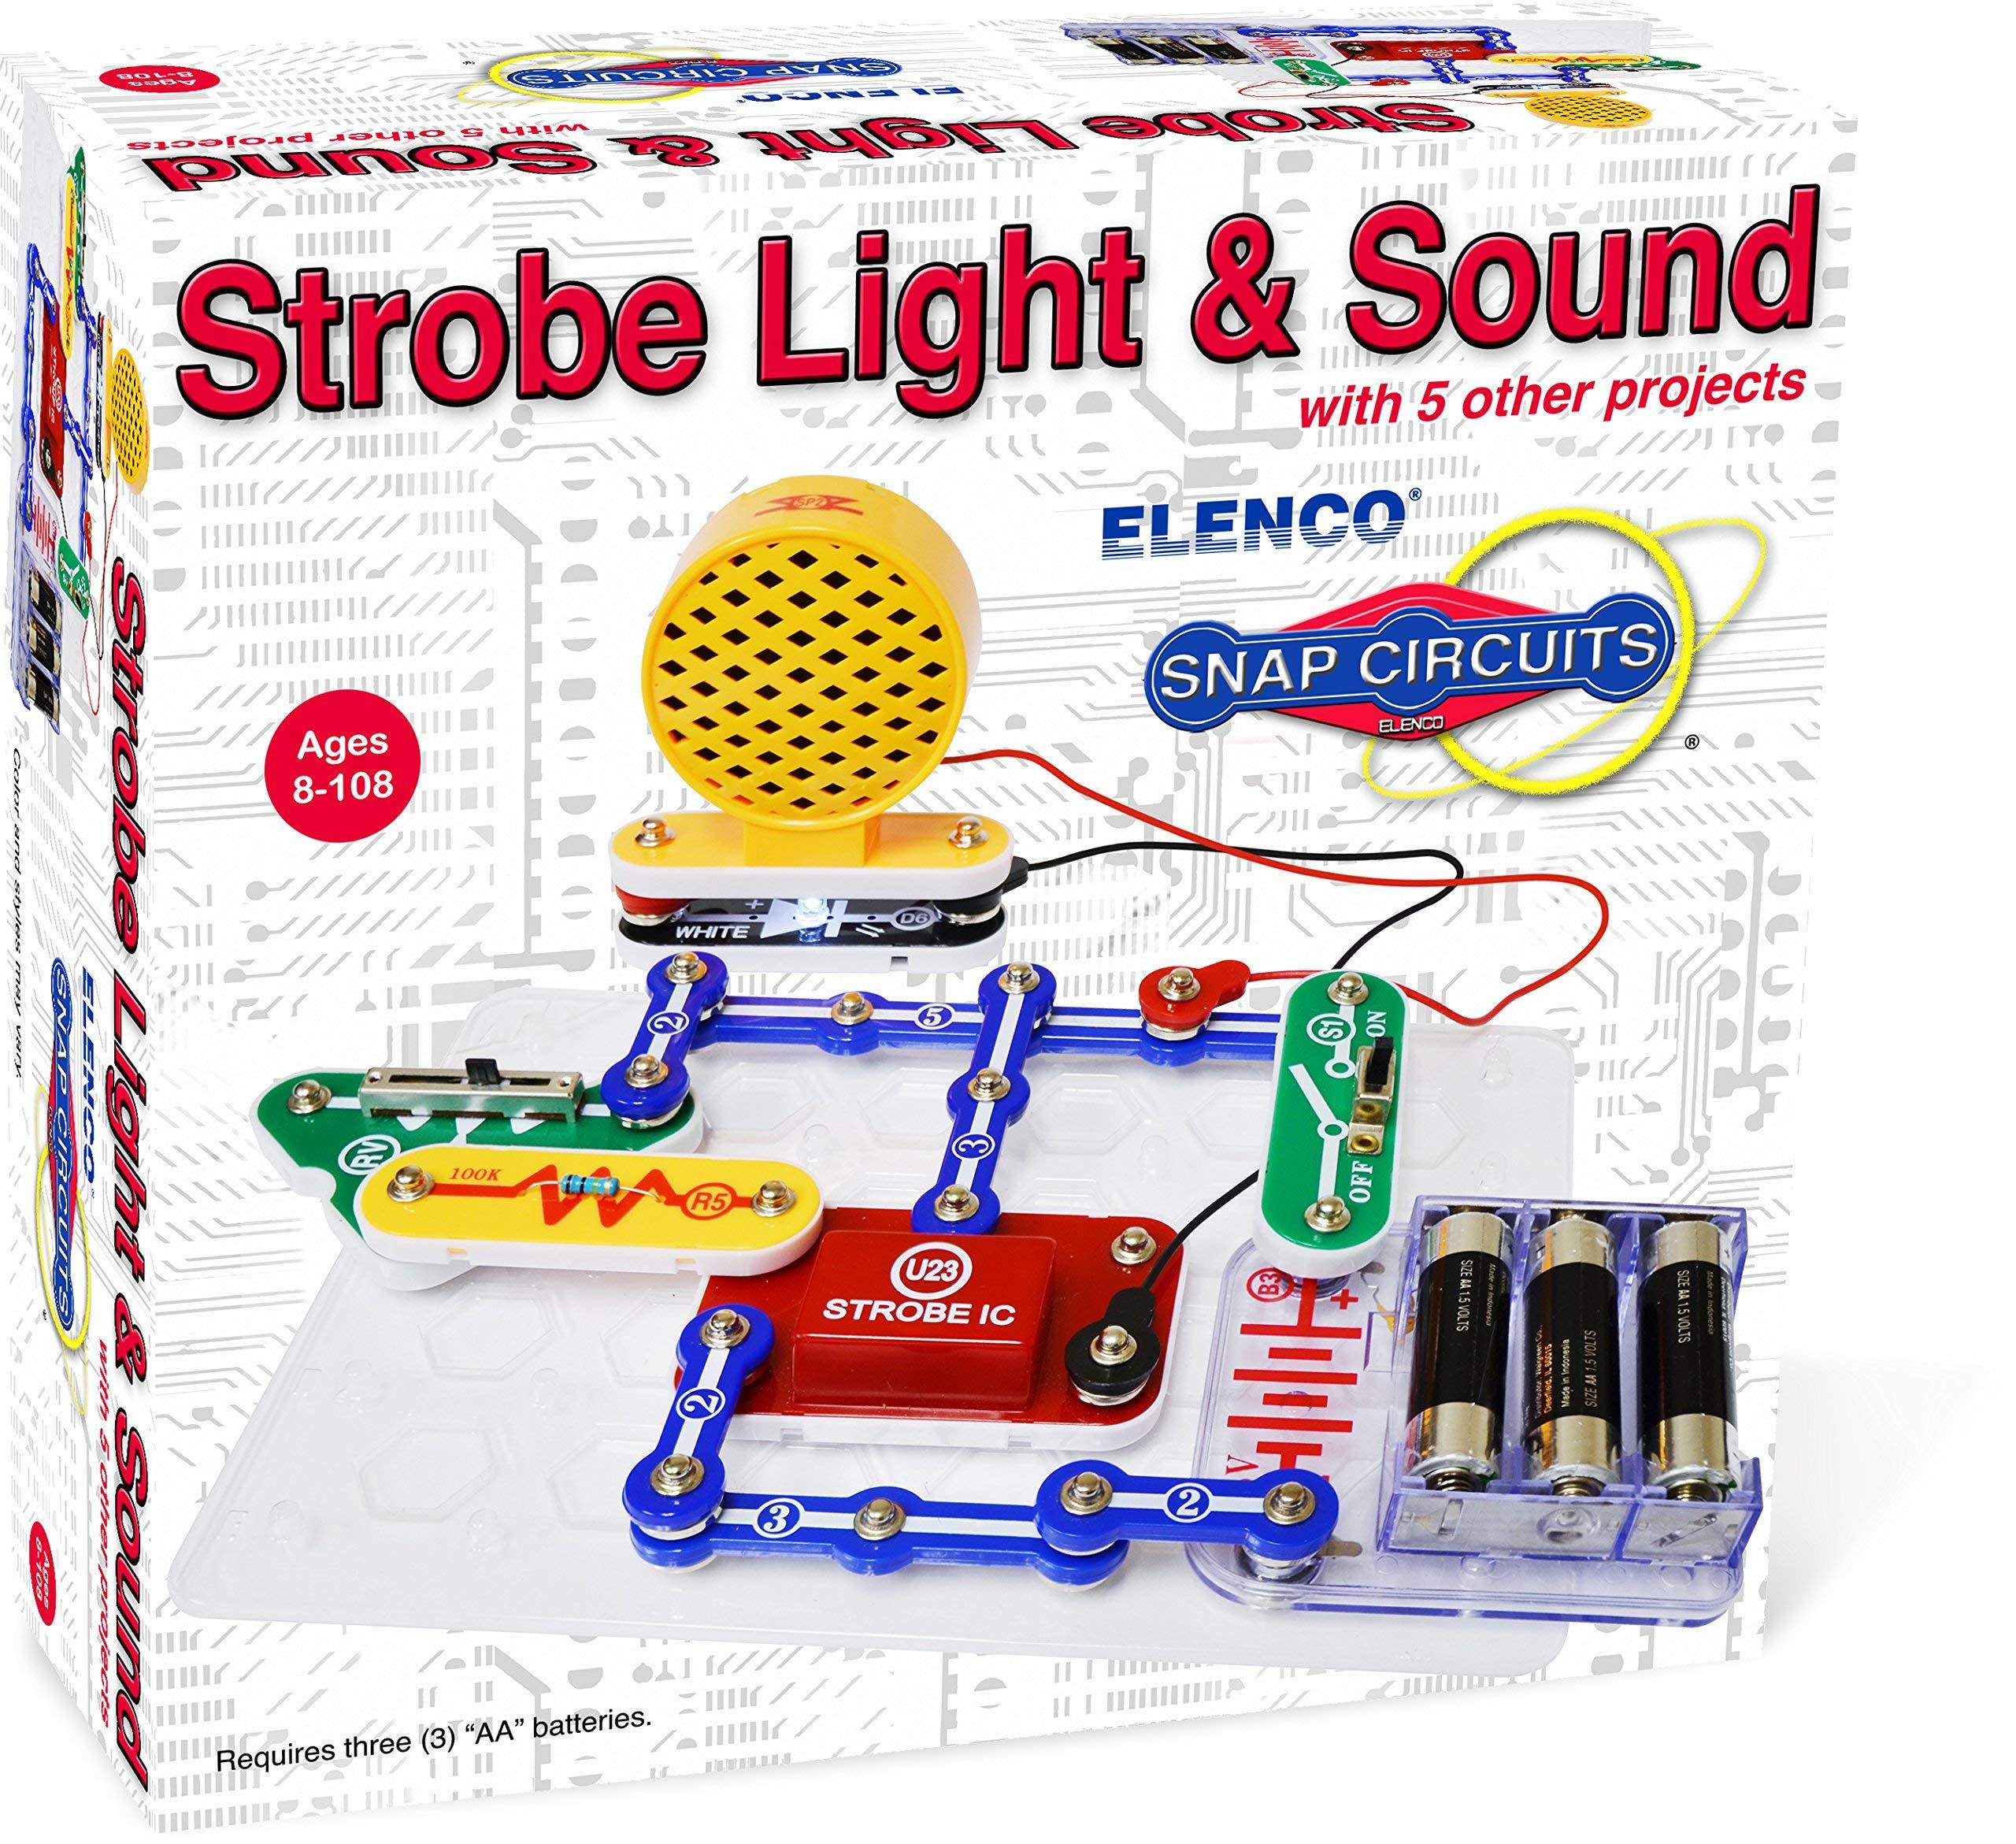 Elenco Electronics SCP-14 Snap Circuits Strobe Light & Sound Kit (Renewed)